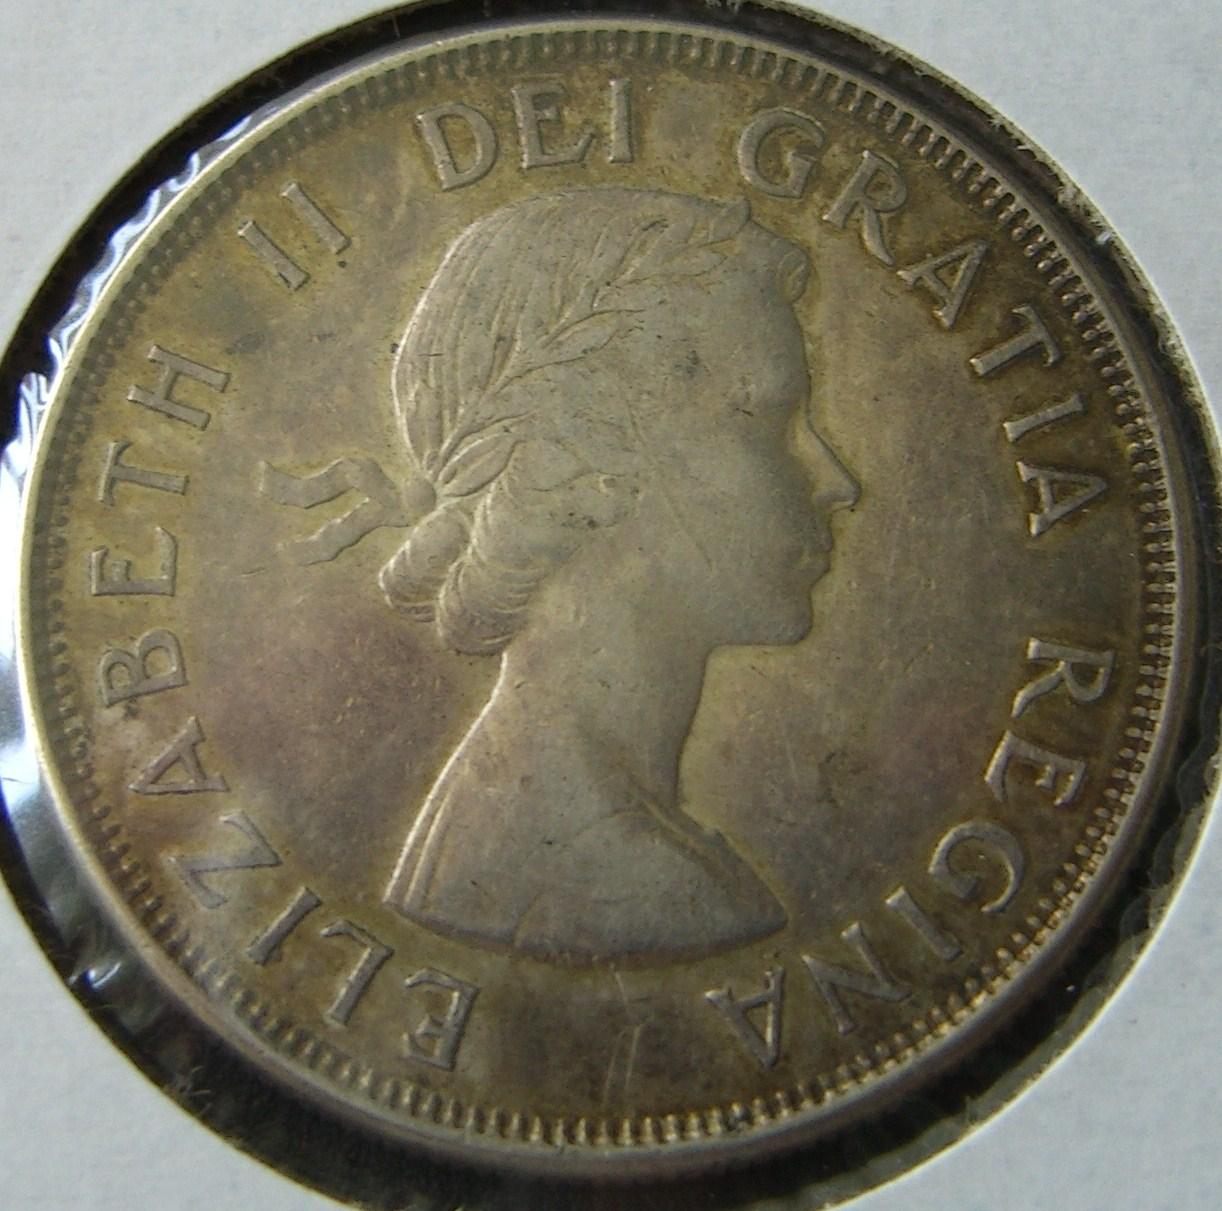 Steve S Coins Canadian 50 Cent Pieces